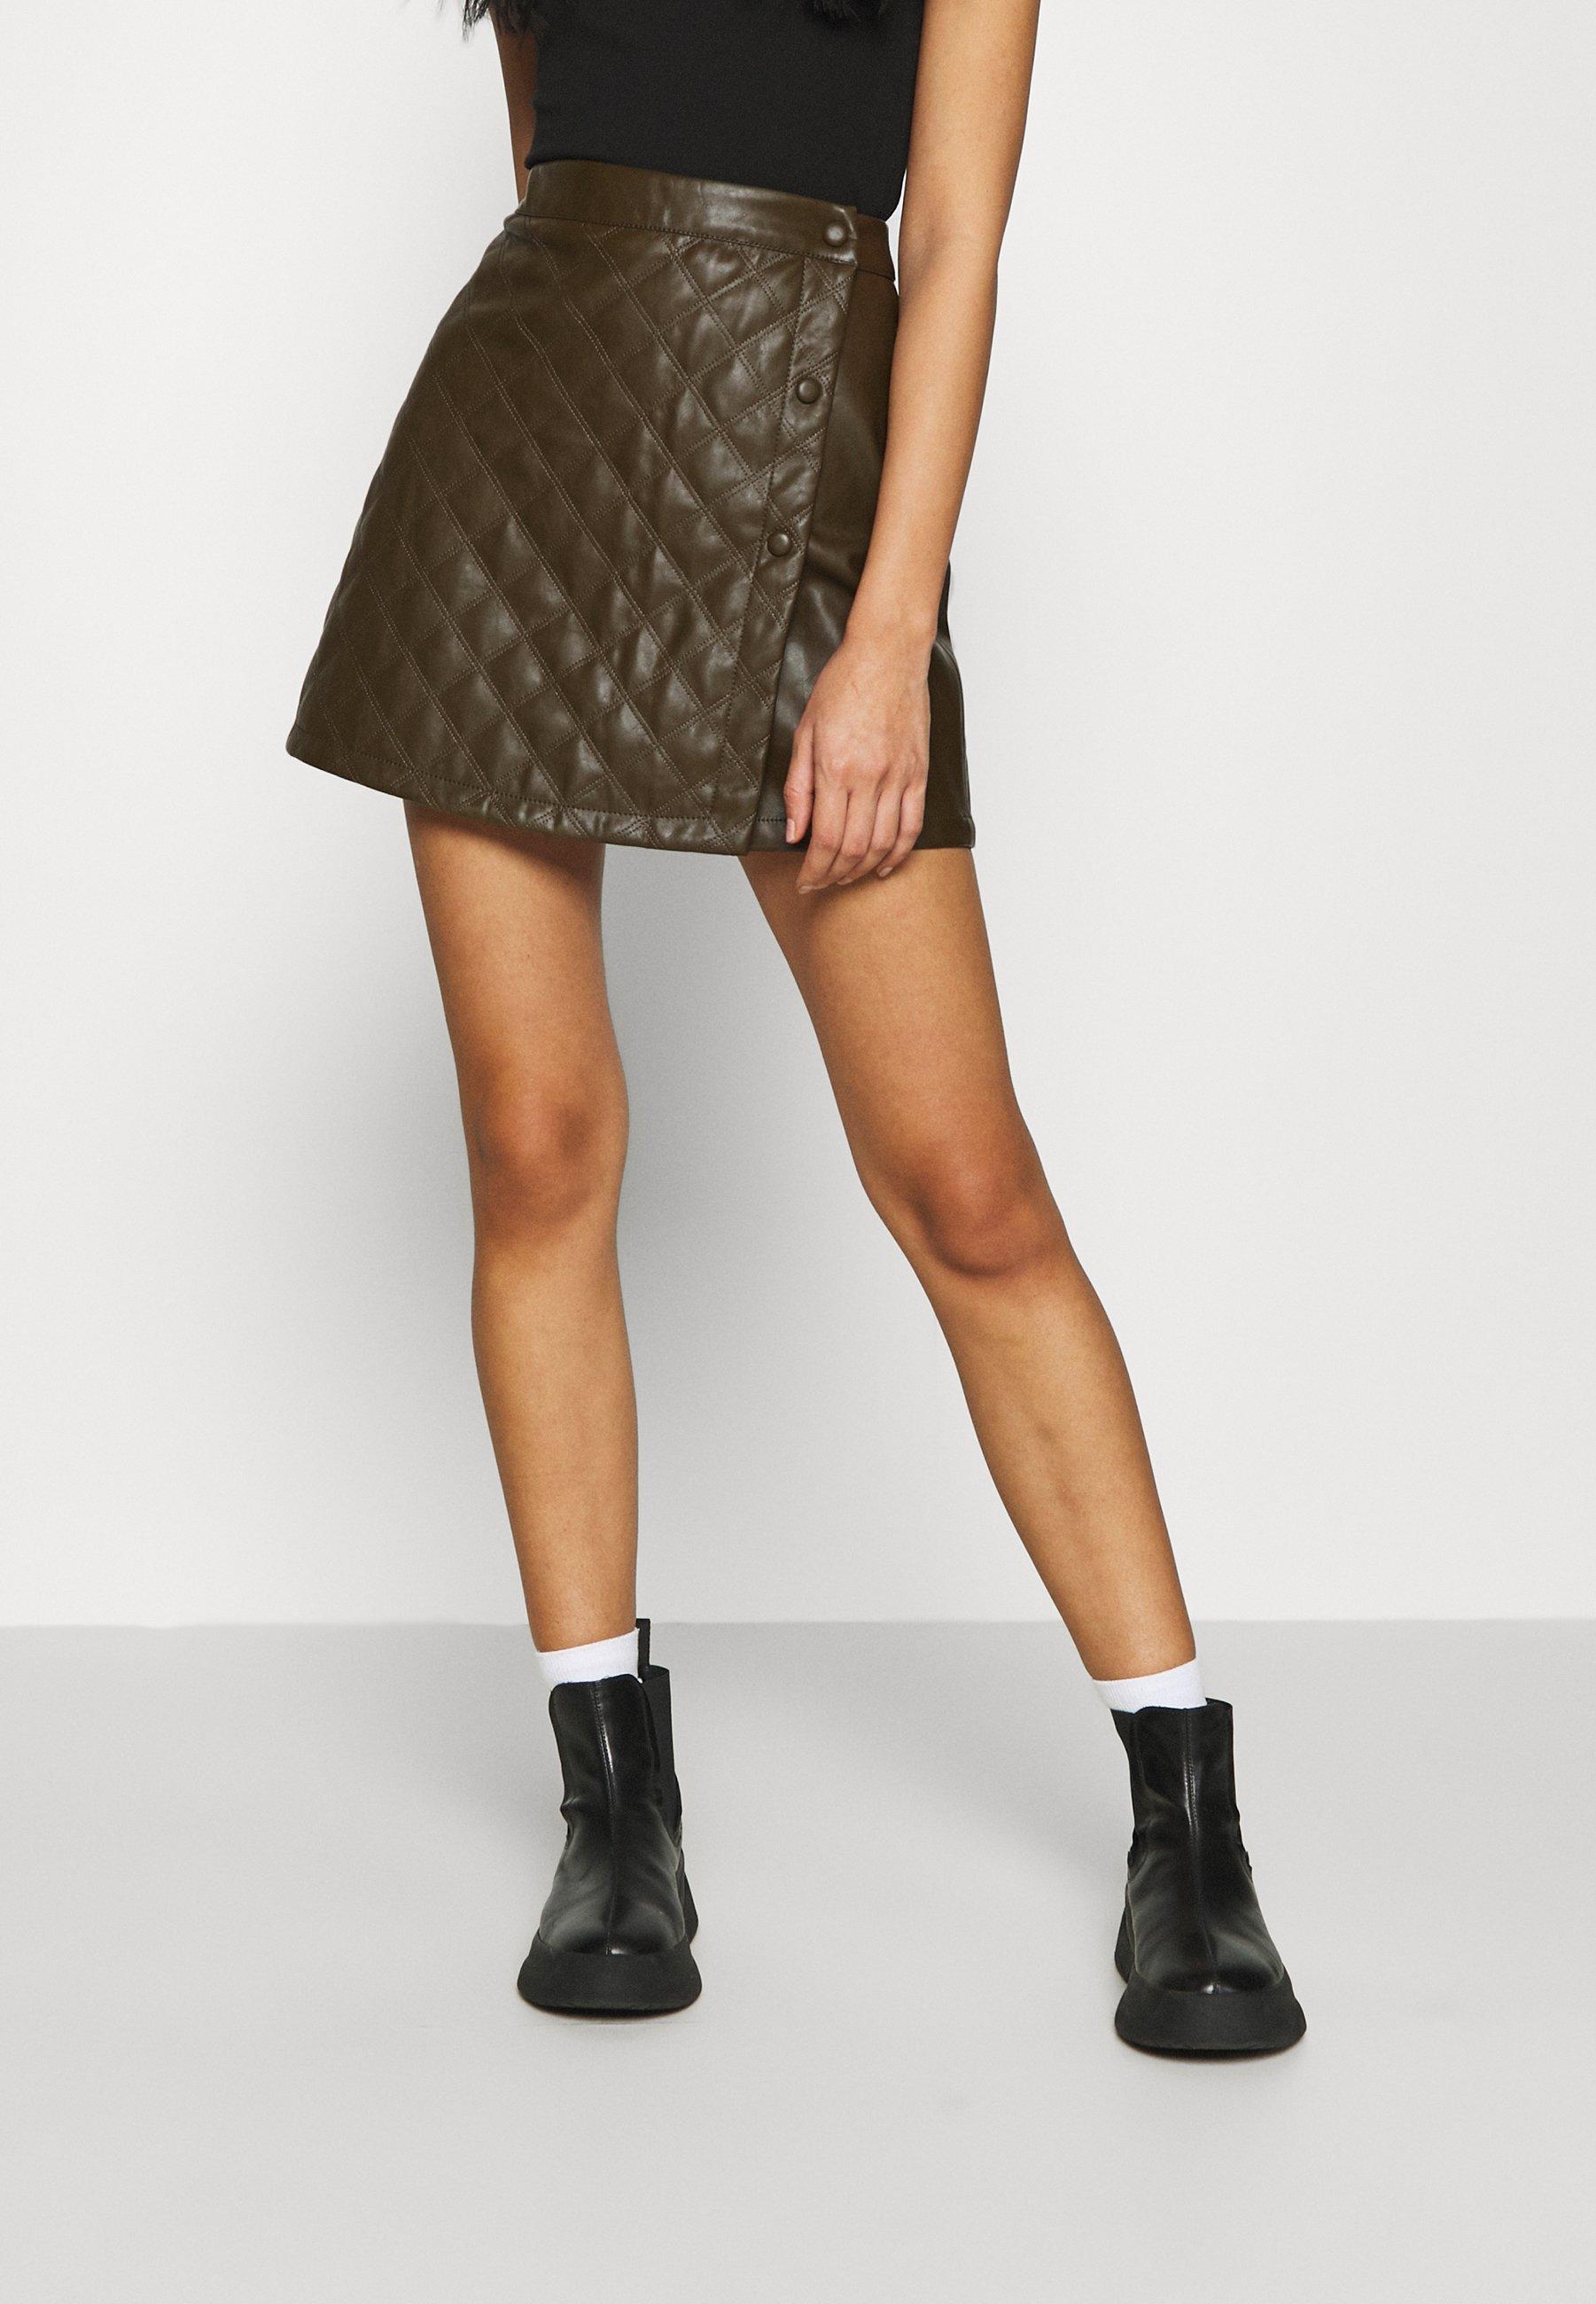 Femme QUILTED WRAP OVER MINI SKIRT - Minijupe - khaki